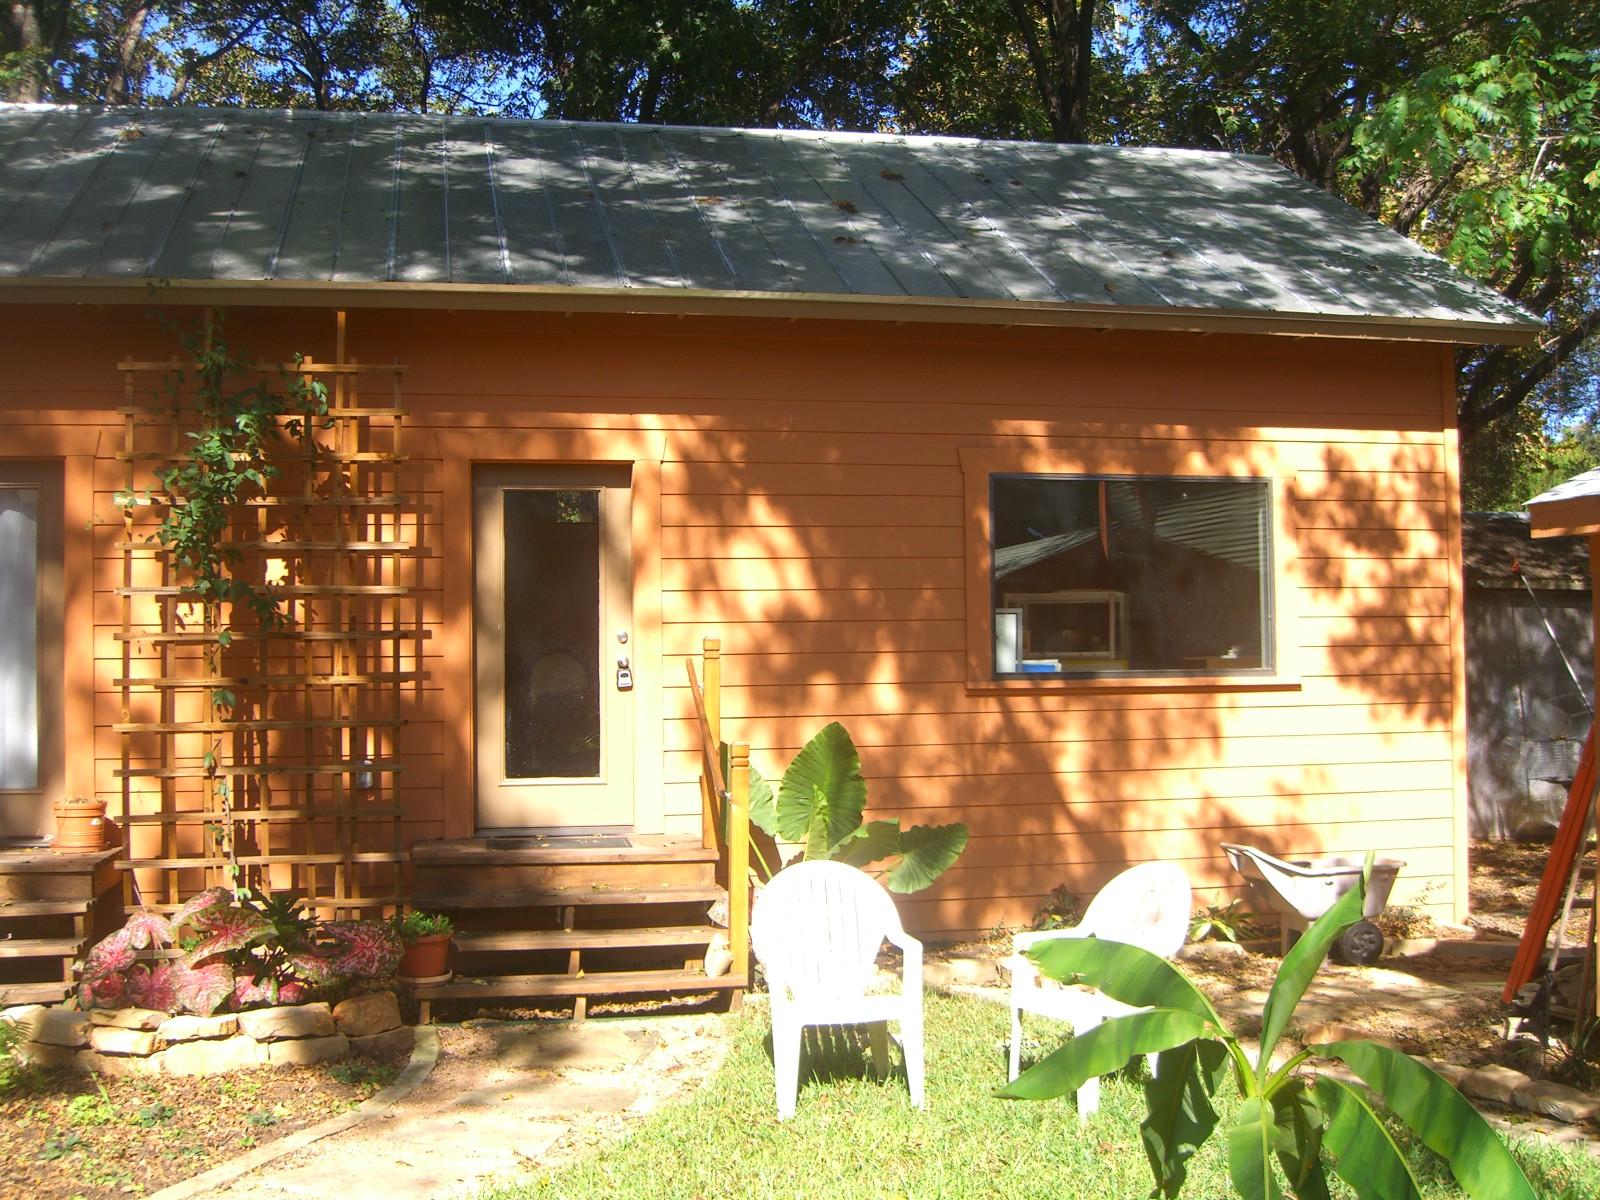 Guest house exterior2.jpg